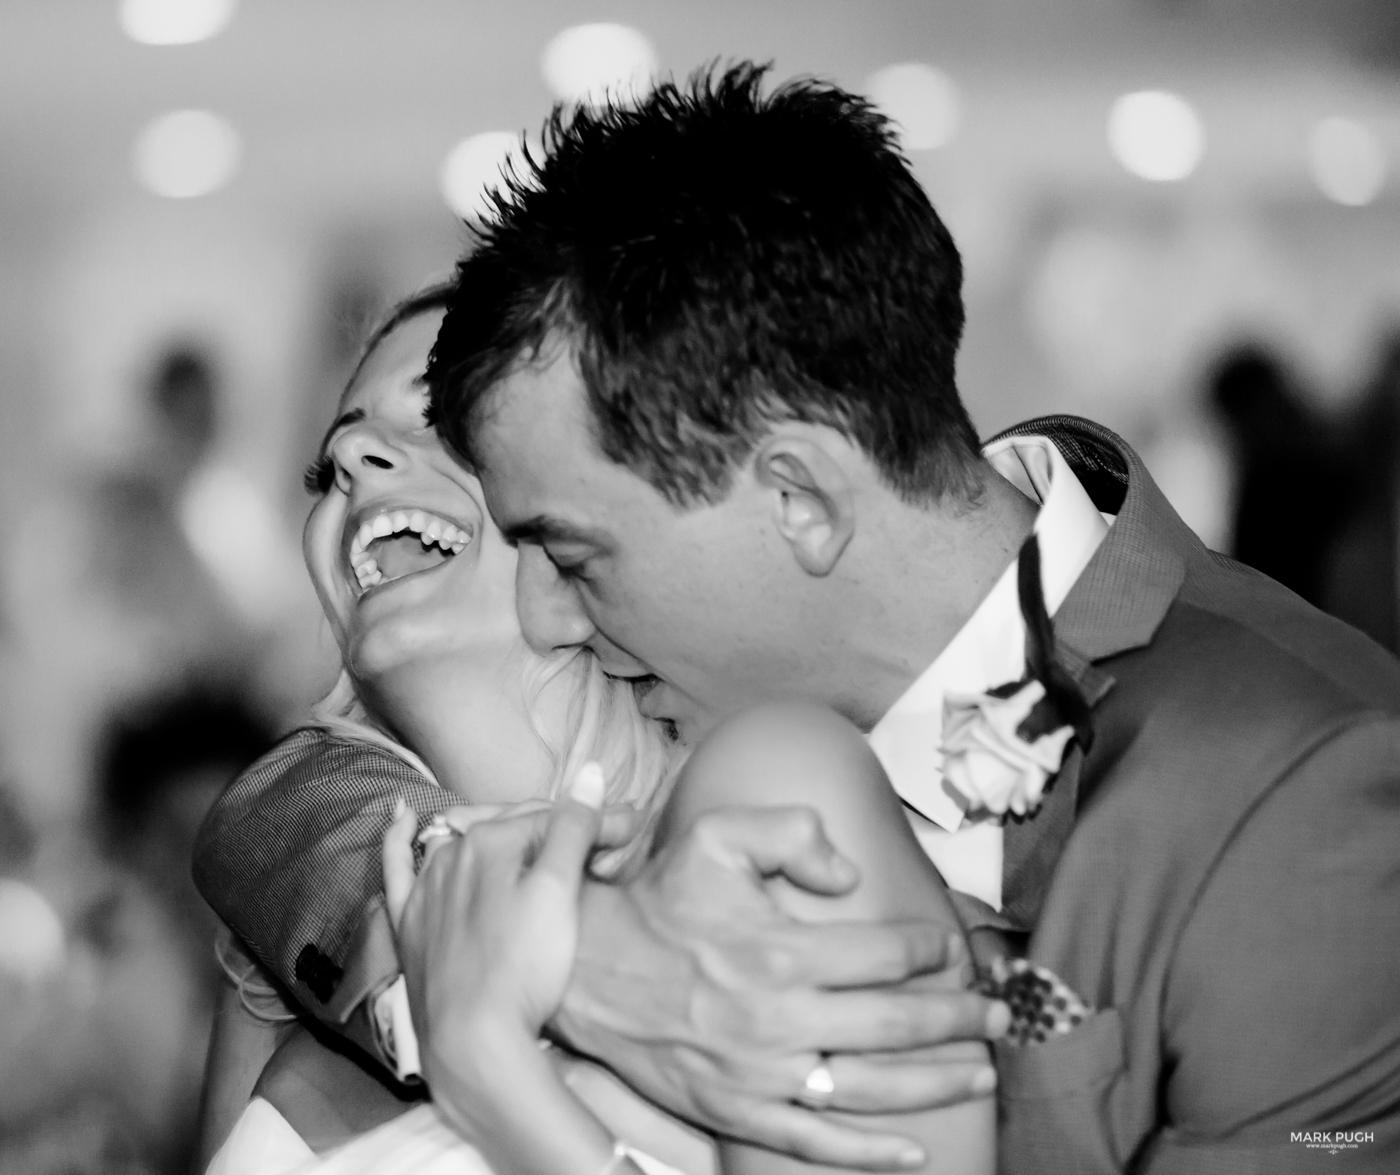 233 Wedding Photography Award winning Wedding Photographer and Videographer Mark Pugh www.markpugh.com.JPG